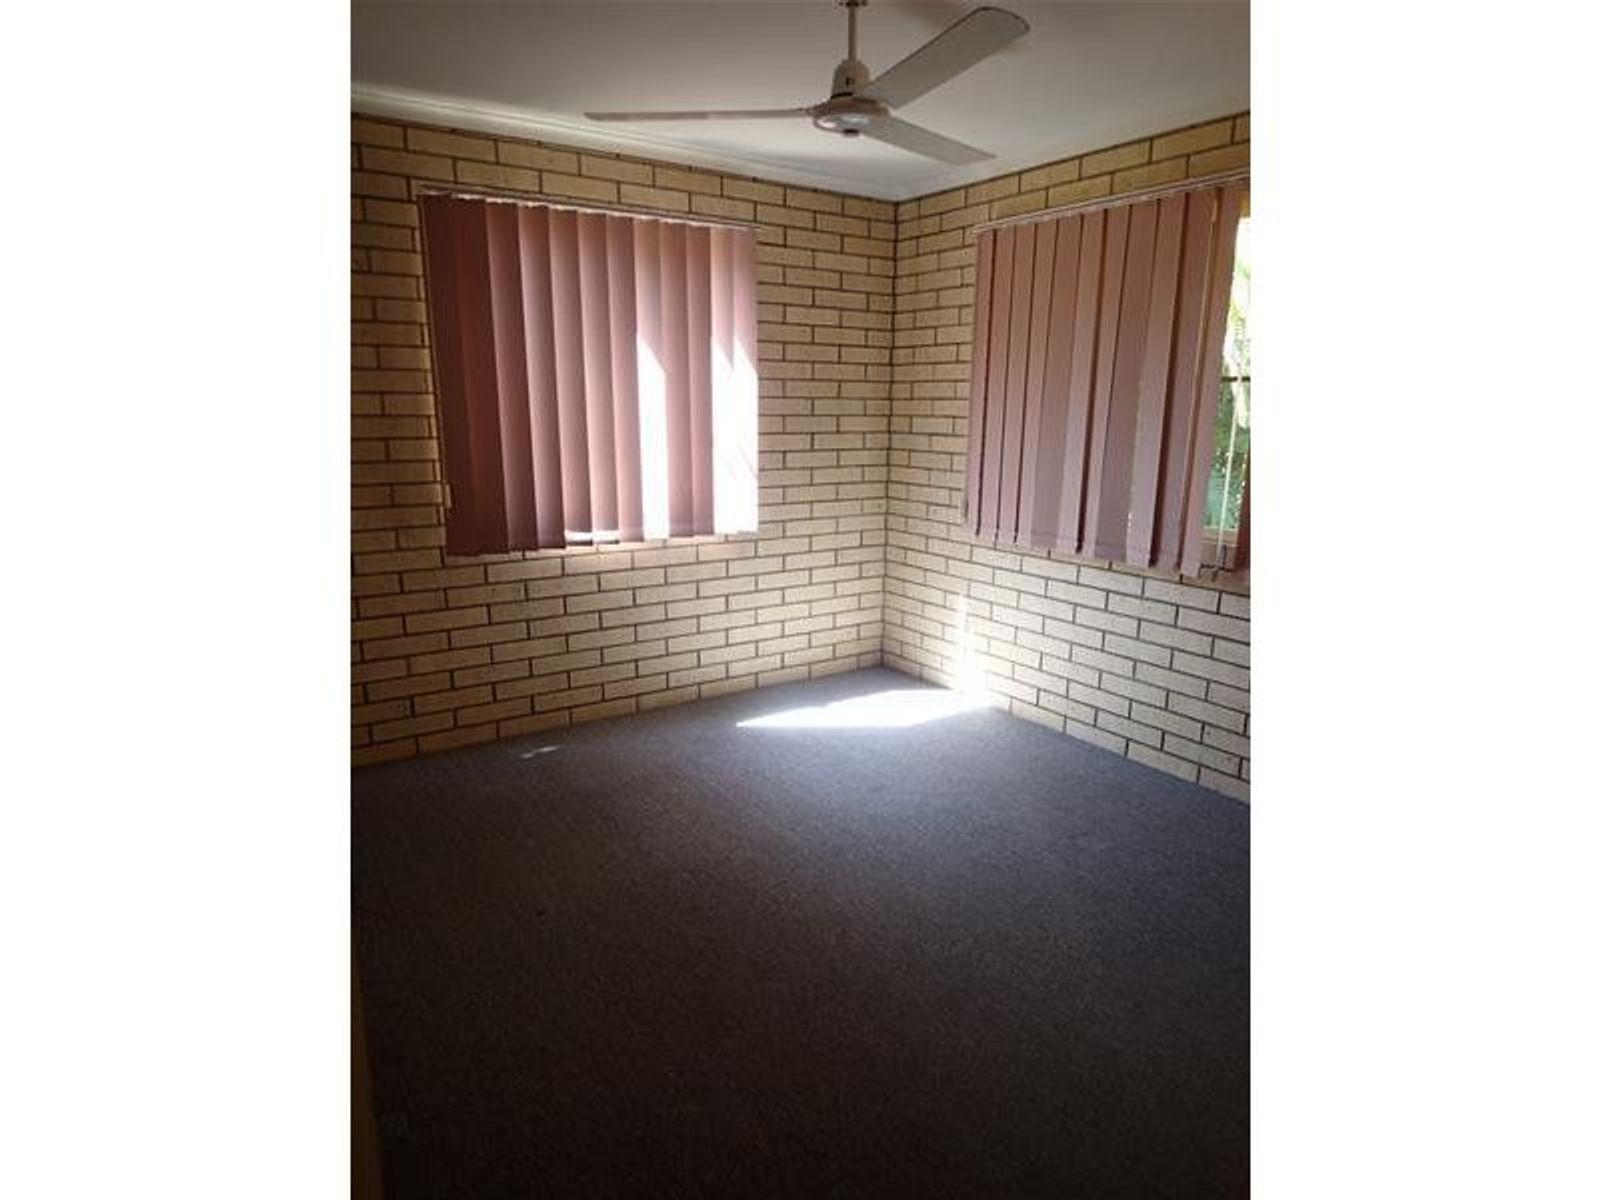 32 Campwin Beach Road, Campwin Beach, QLD 4737